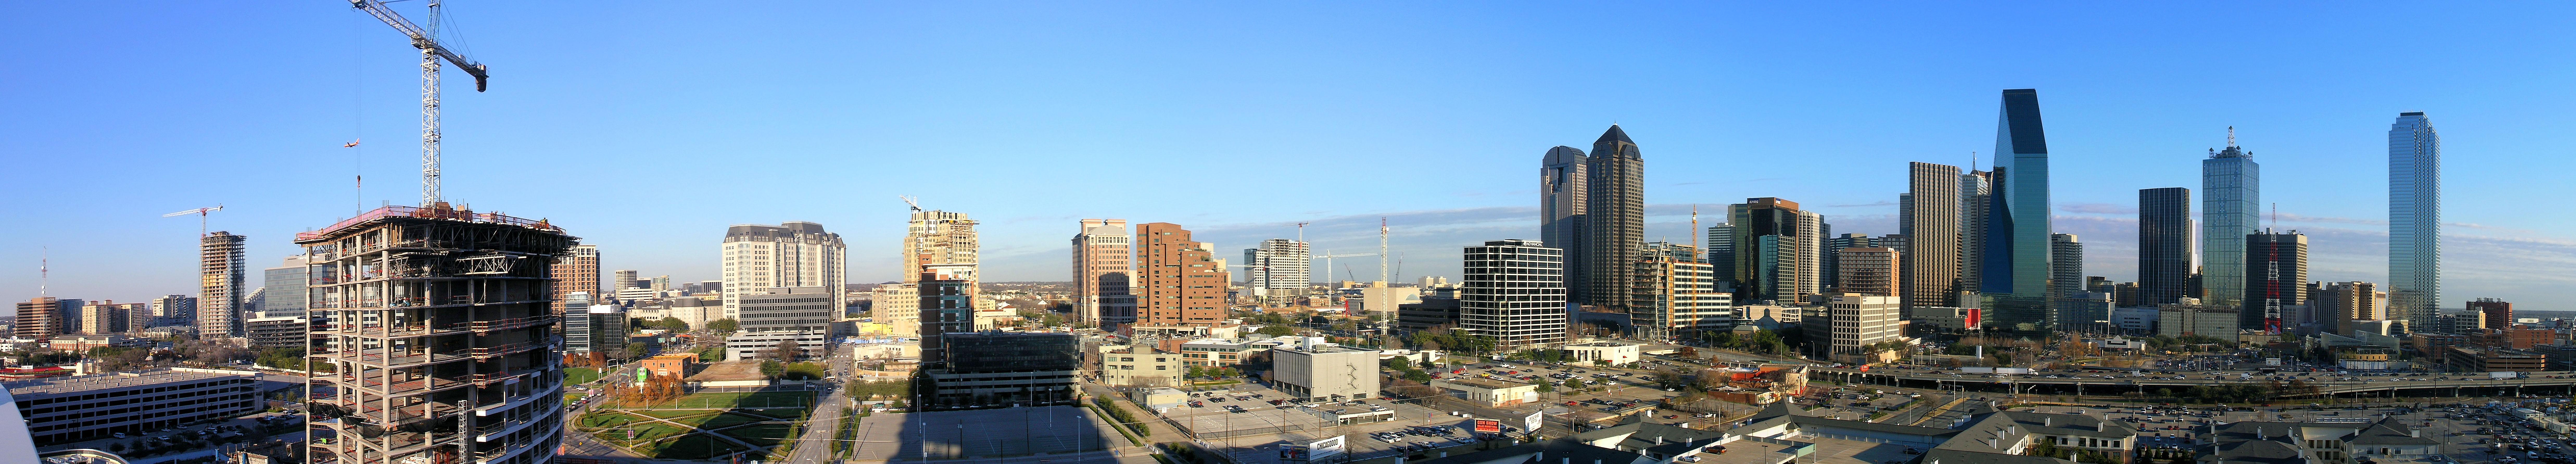 [Obrazek: Dallas%2C_Texas_Skyline_2006.jpg]